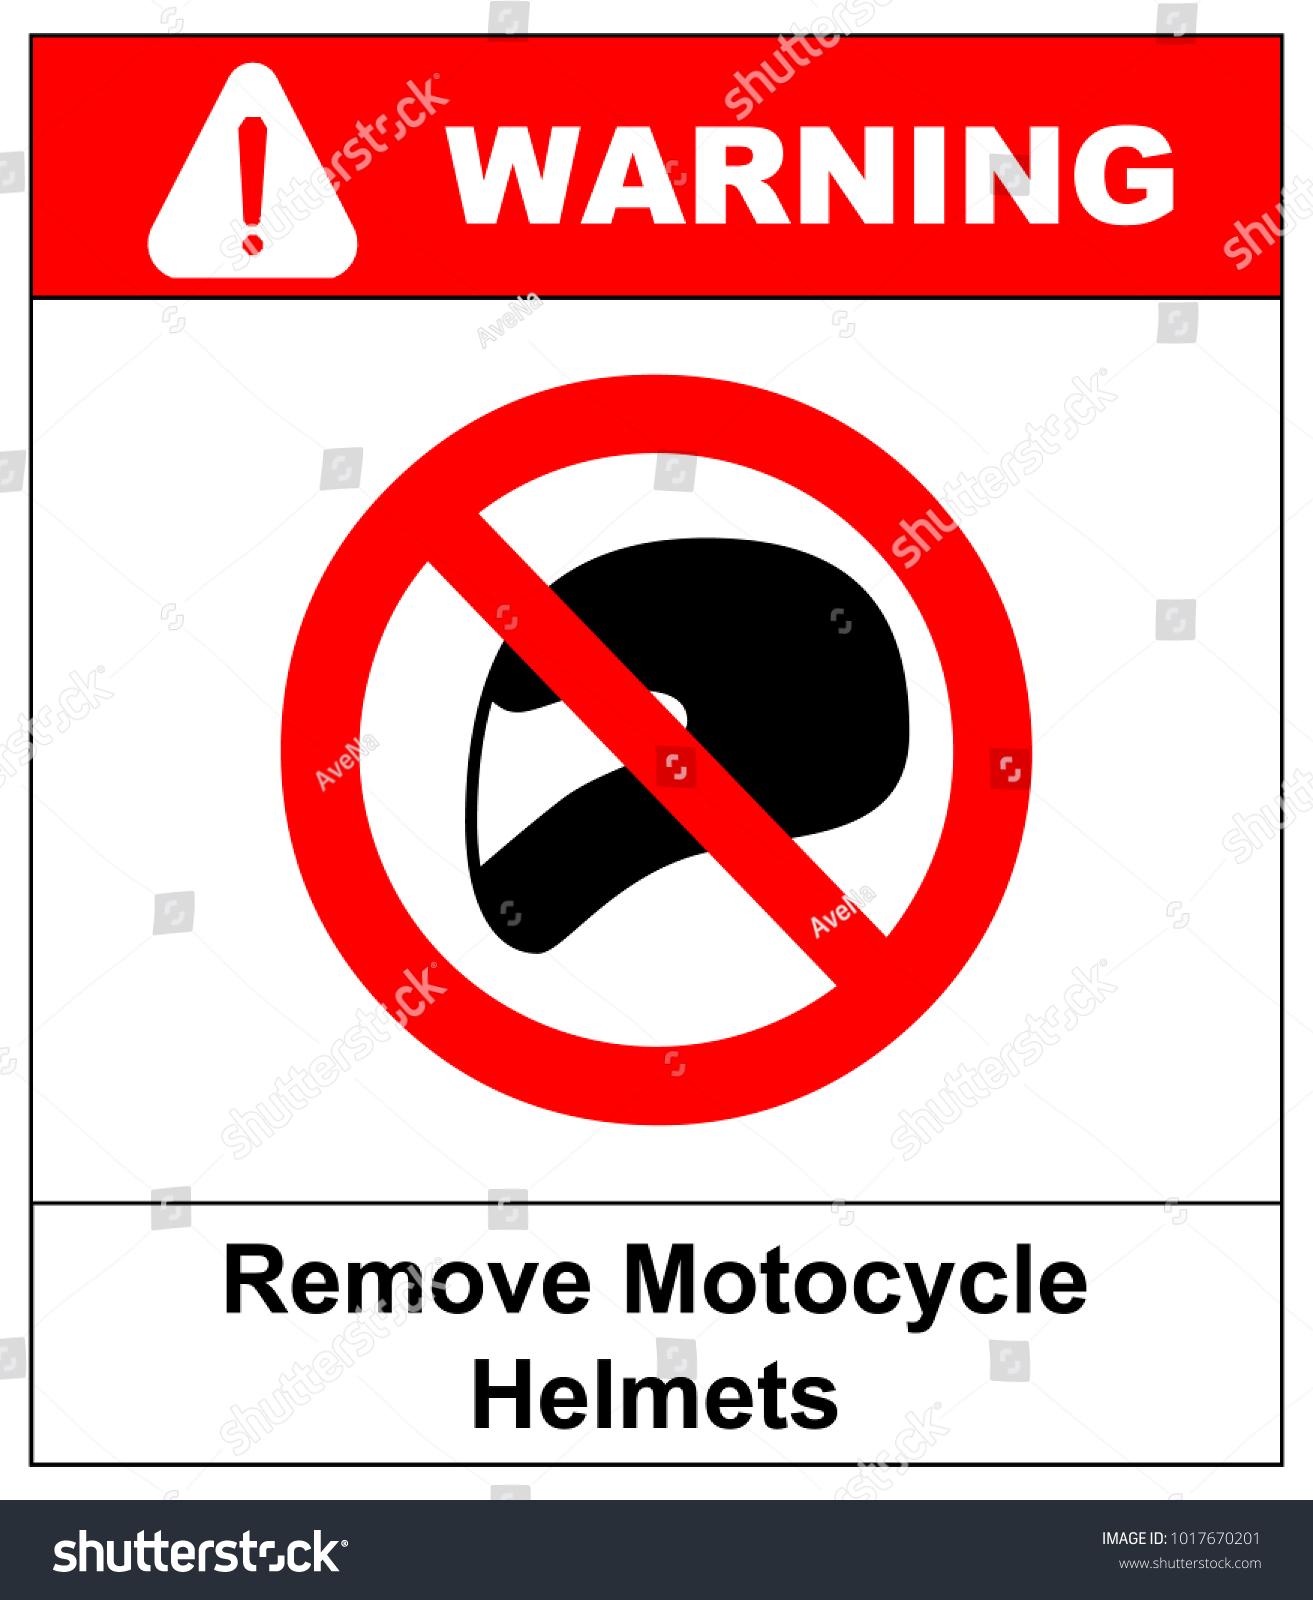 Remove Motorcycle Helmets Icon Symbol Protection Stock Vector